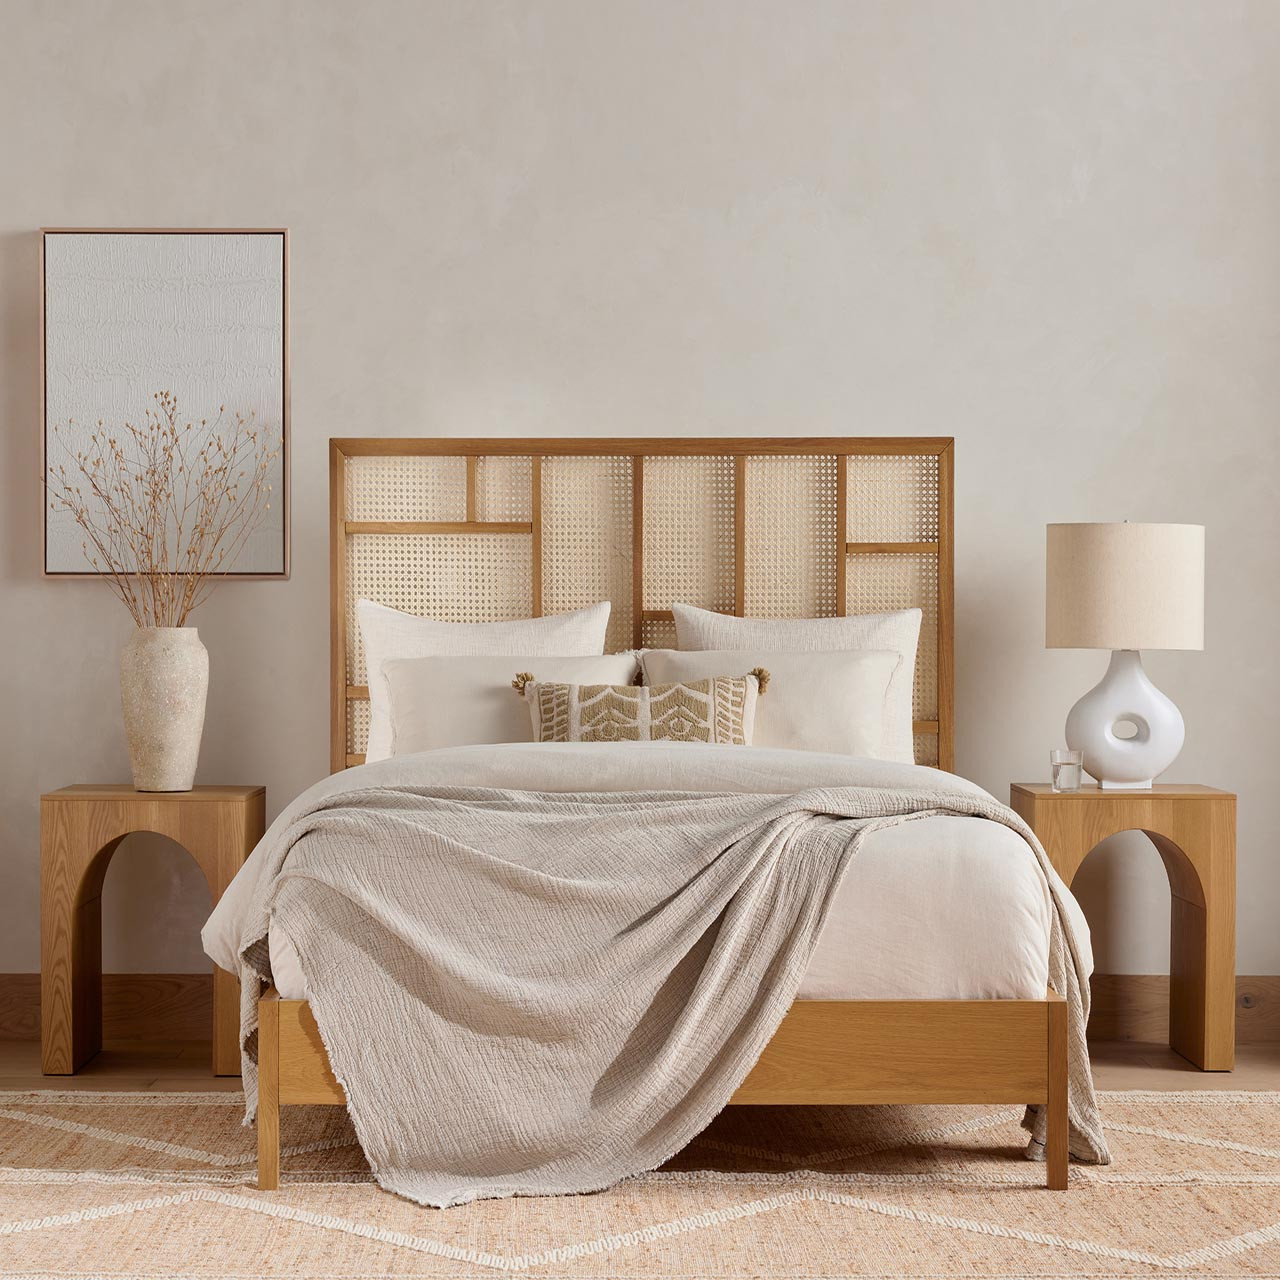 Jenny Cane Bed